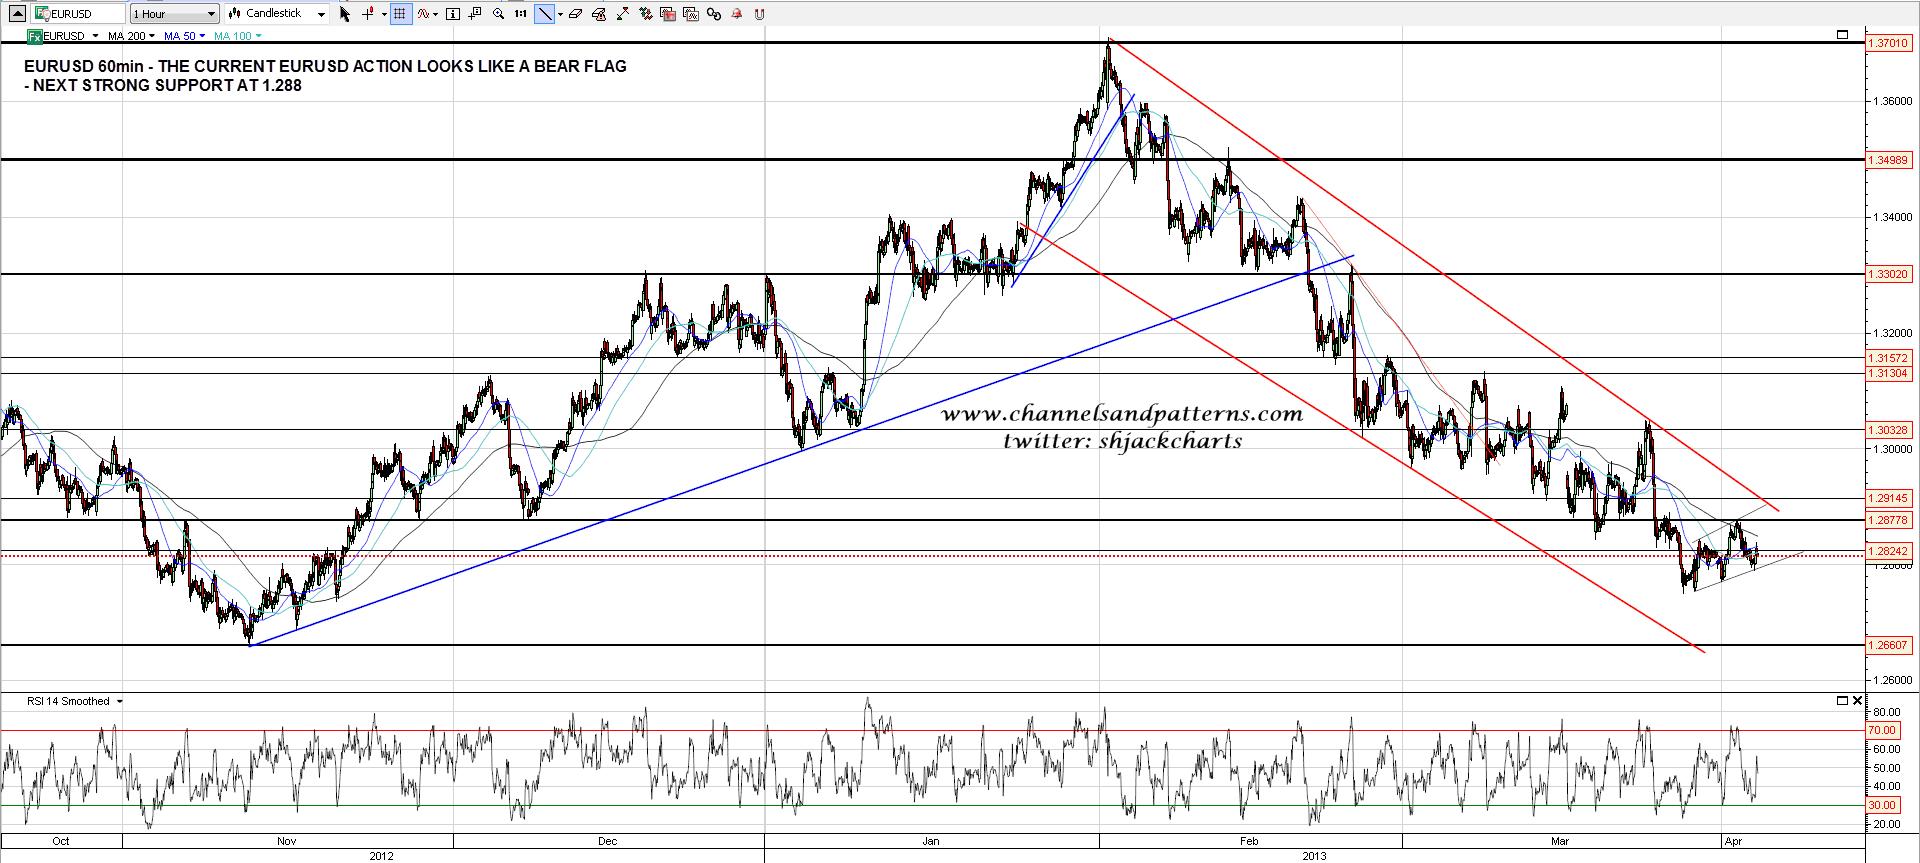 130403 EURUSD 60min Trendlines